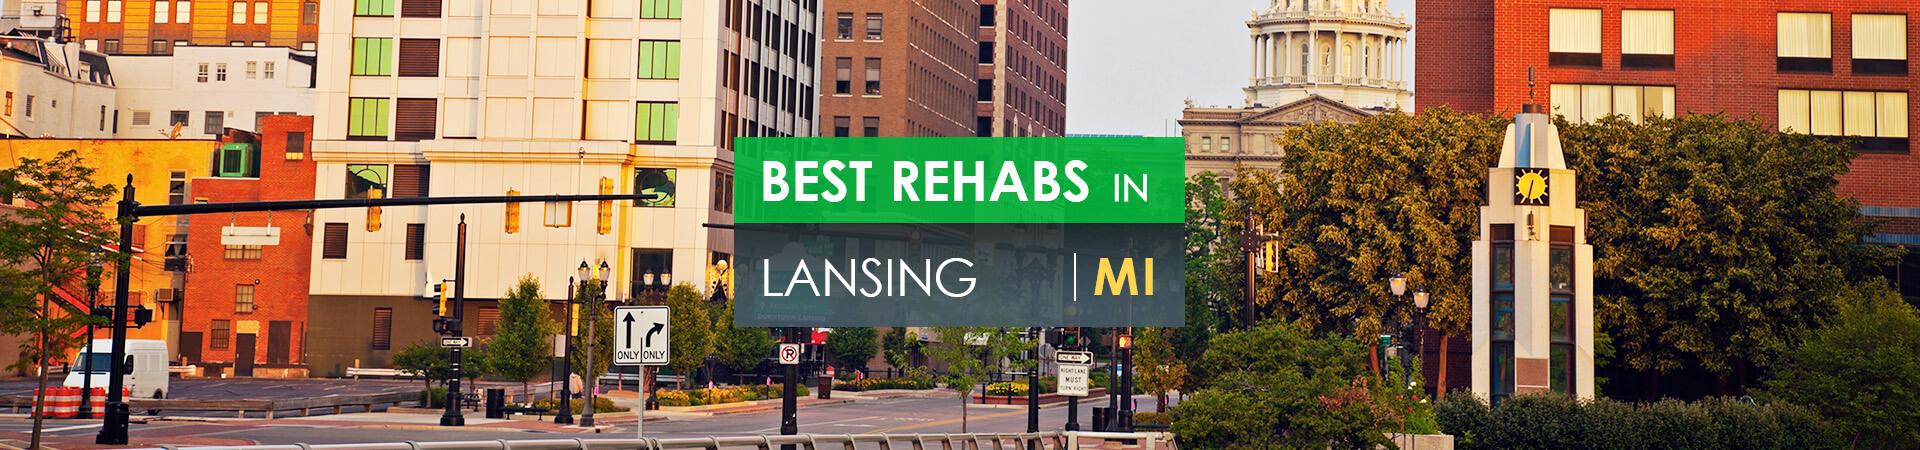 Best rehabs in Lansing, MI